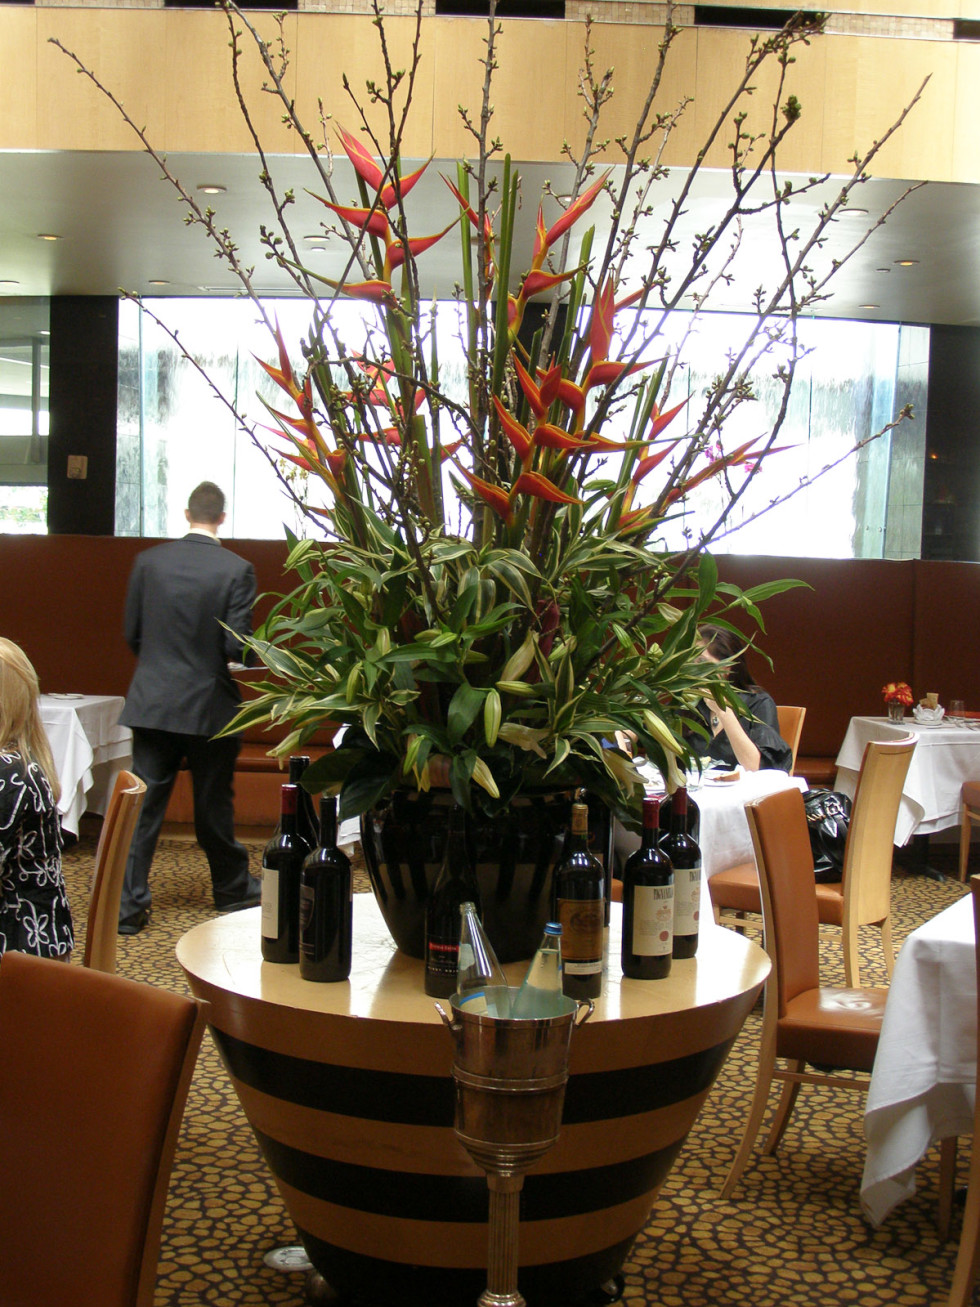 News_Tony's_restaurant_centerpiece_flowers